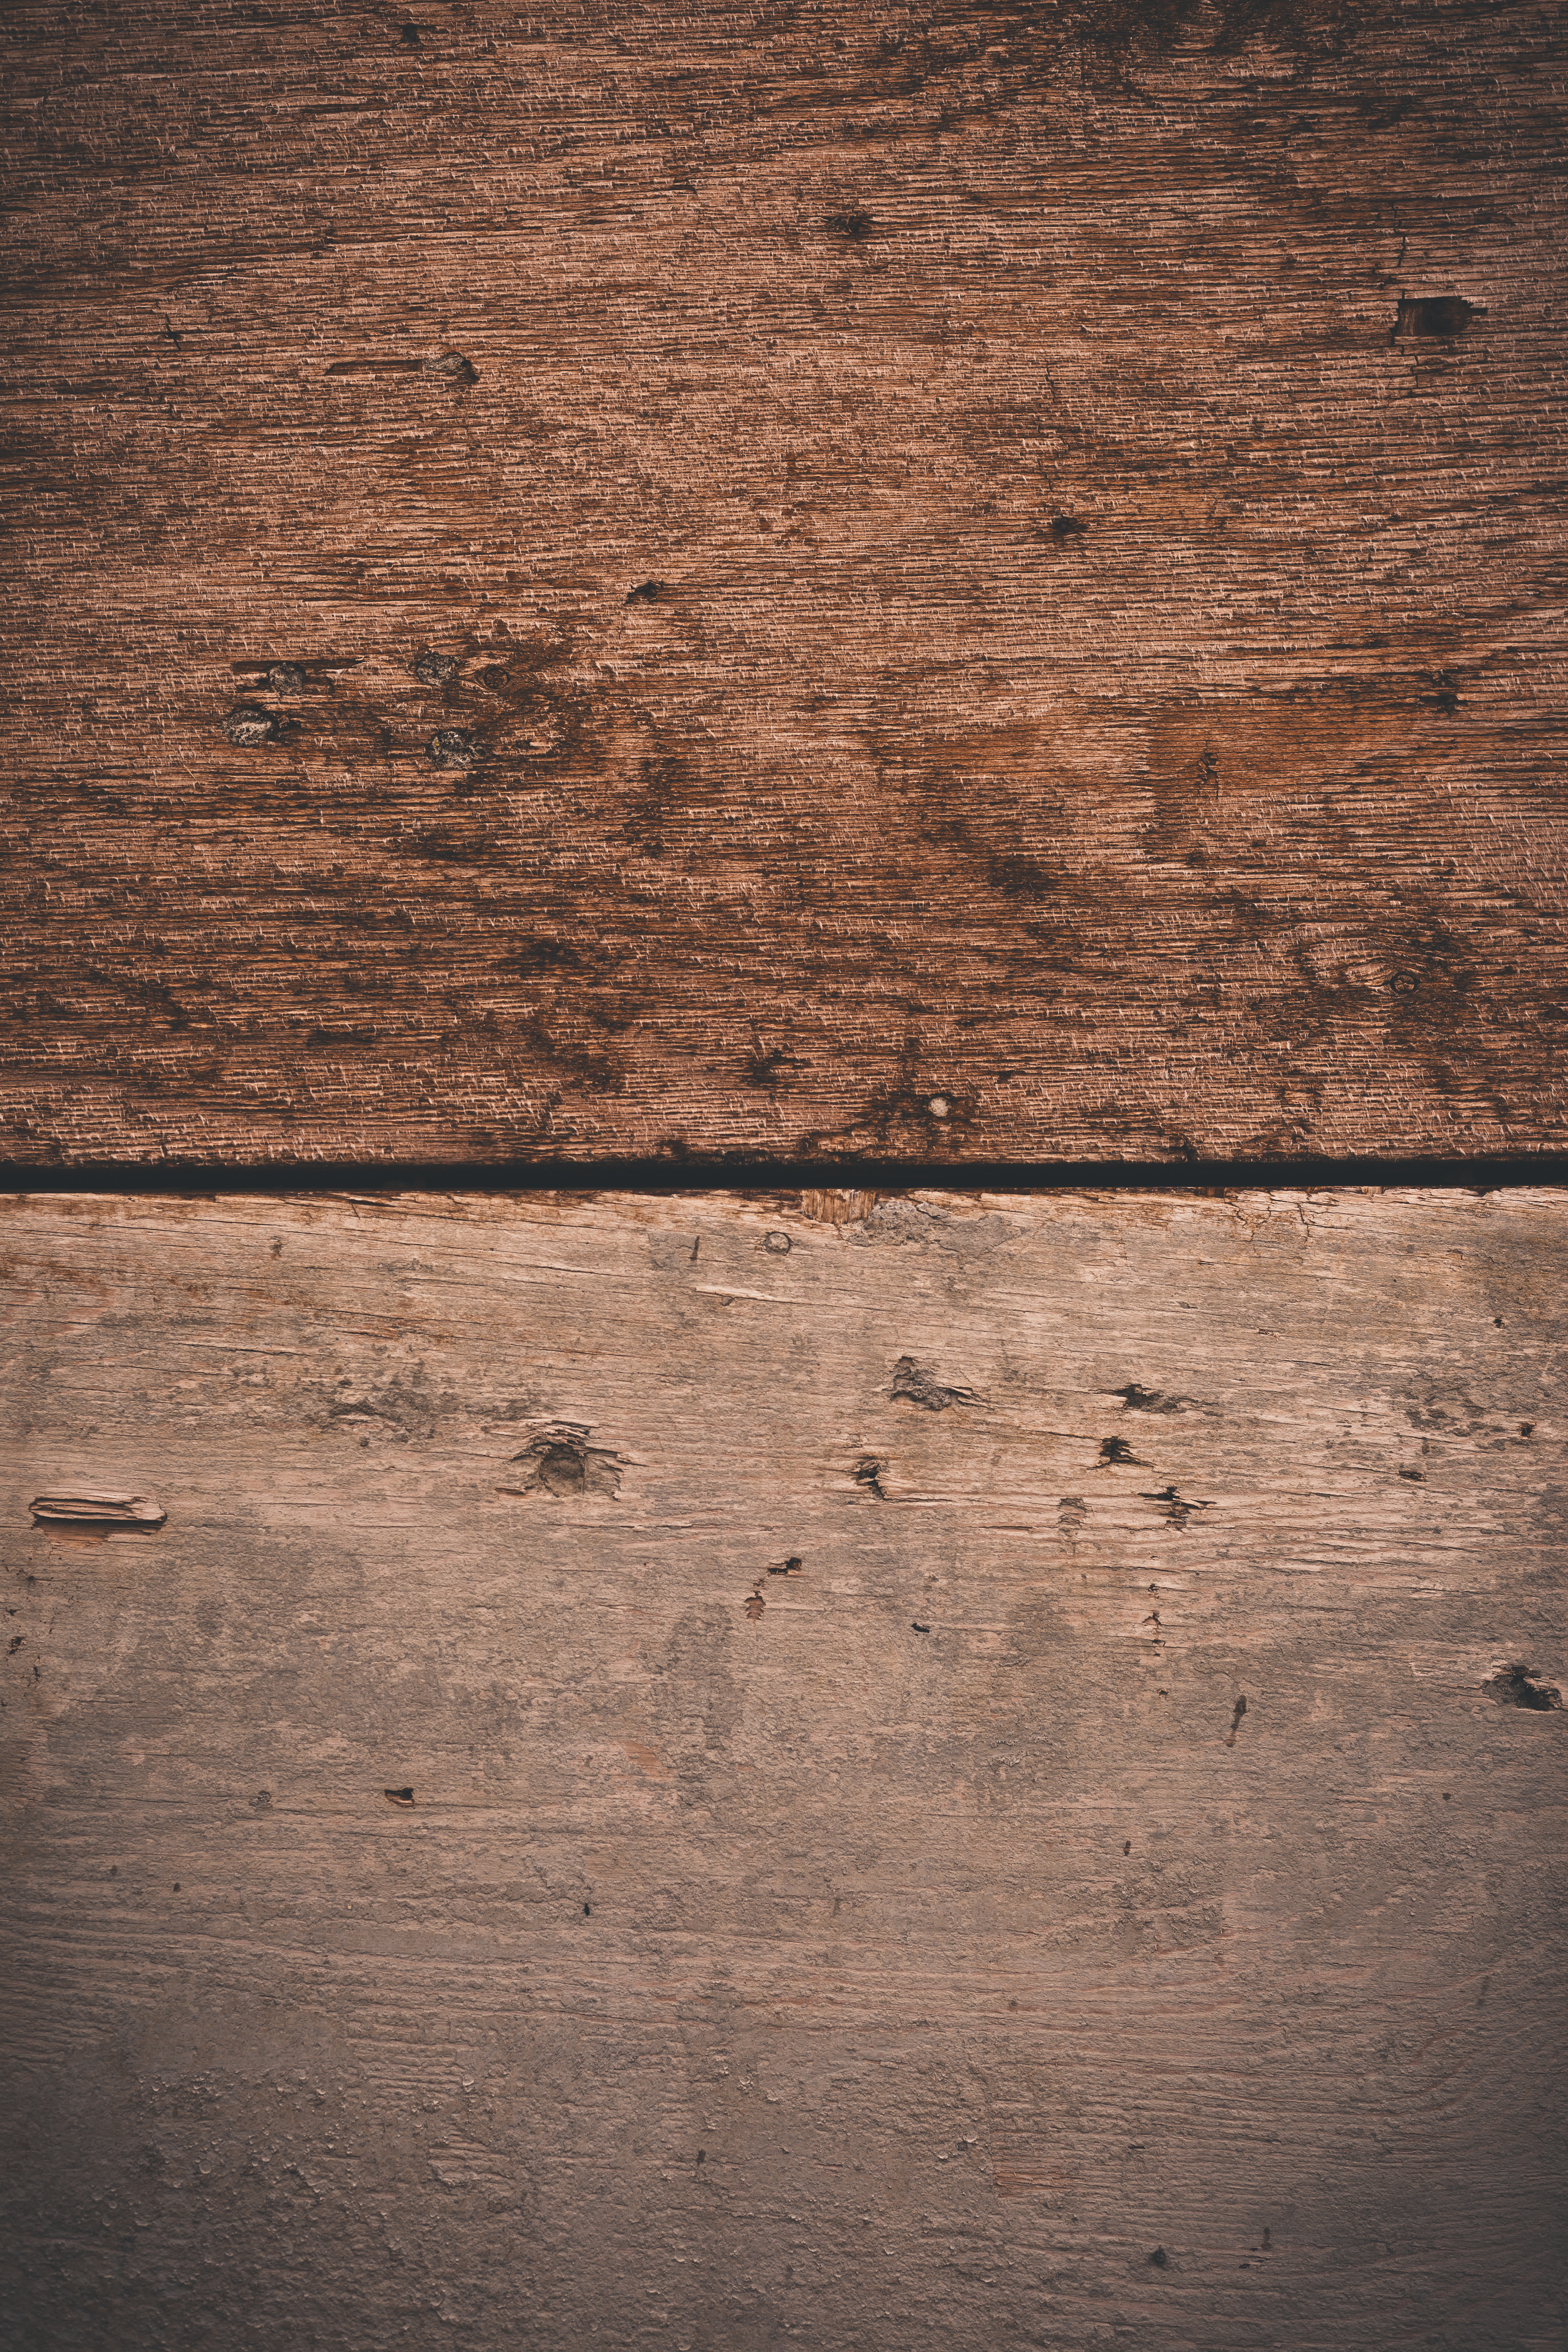 Grunge Wooden Texture, Grunge, Grungy, Old, Planks, HQ Photo